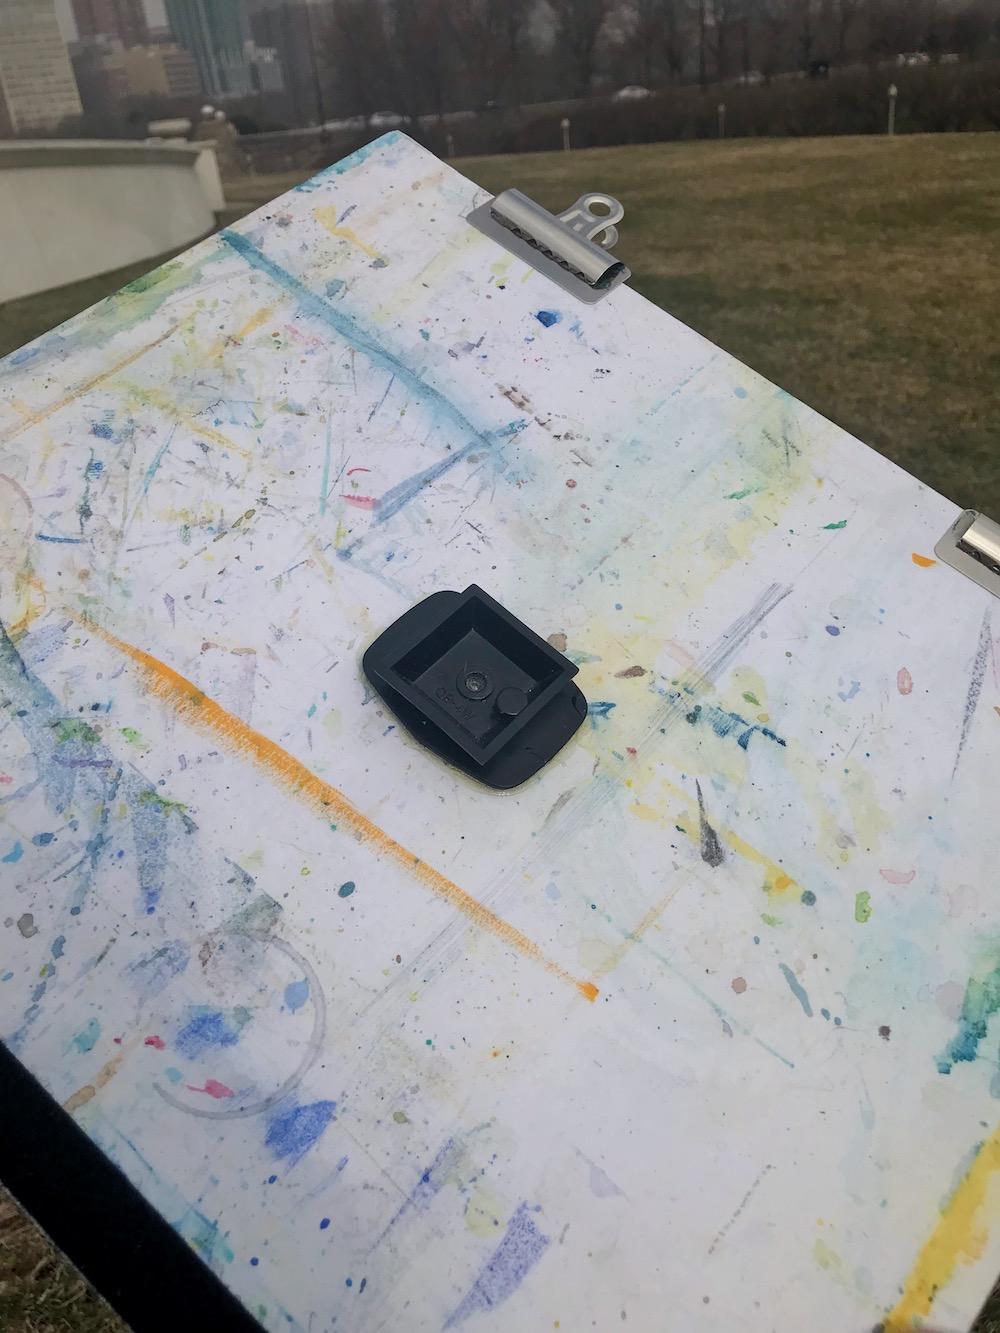 Art board fastened to tripod quick release plate